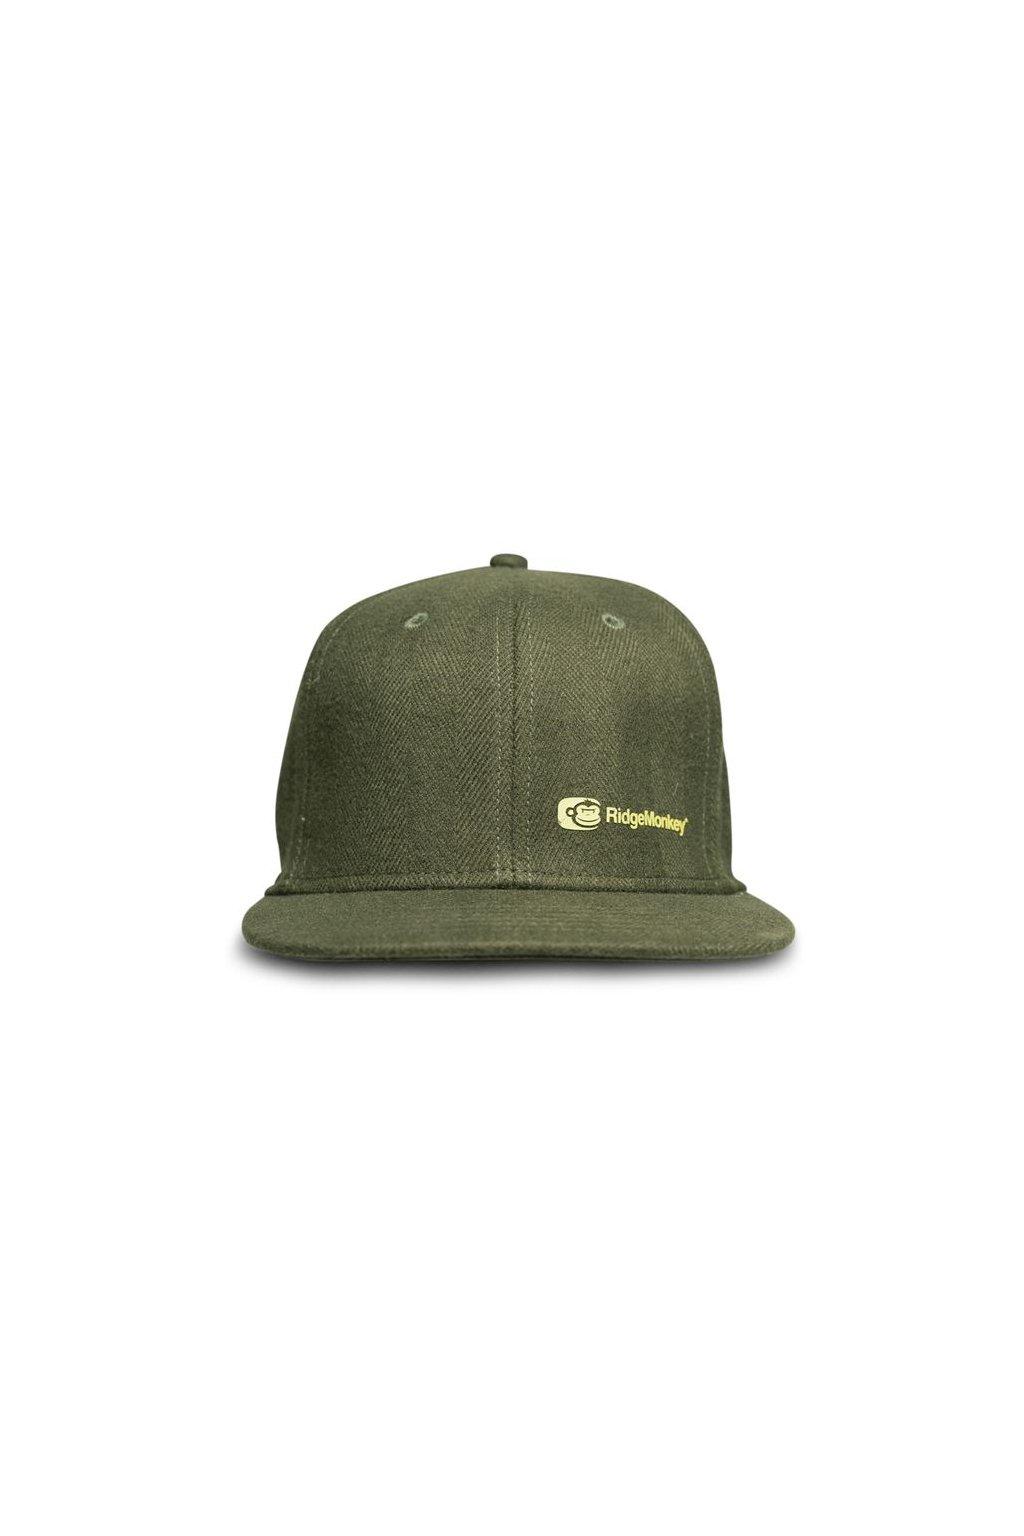 RidgeMonkey: Kšiltovka APEarel Dropback Snapback Cap Green